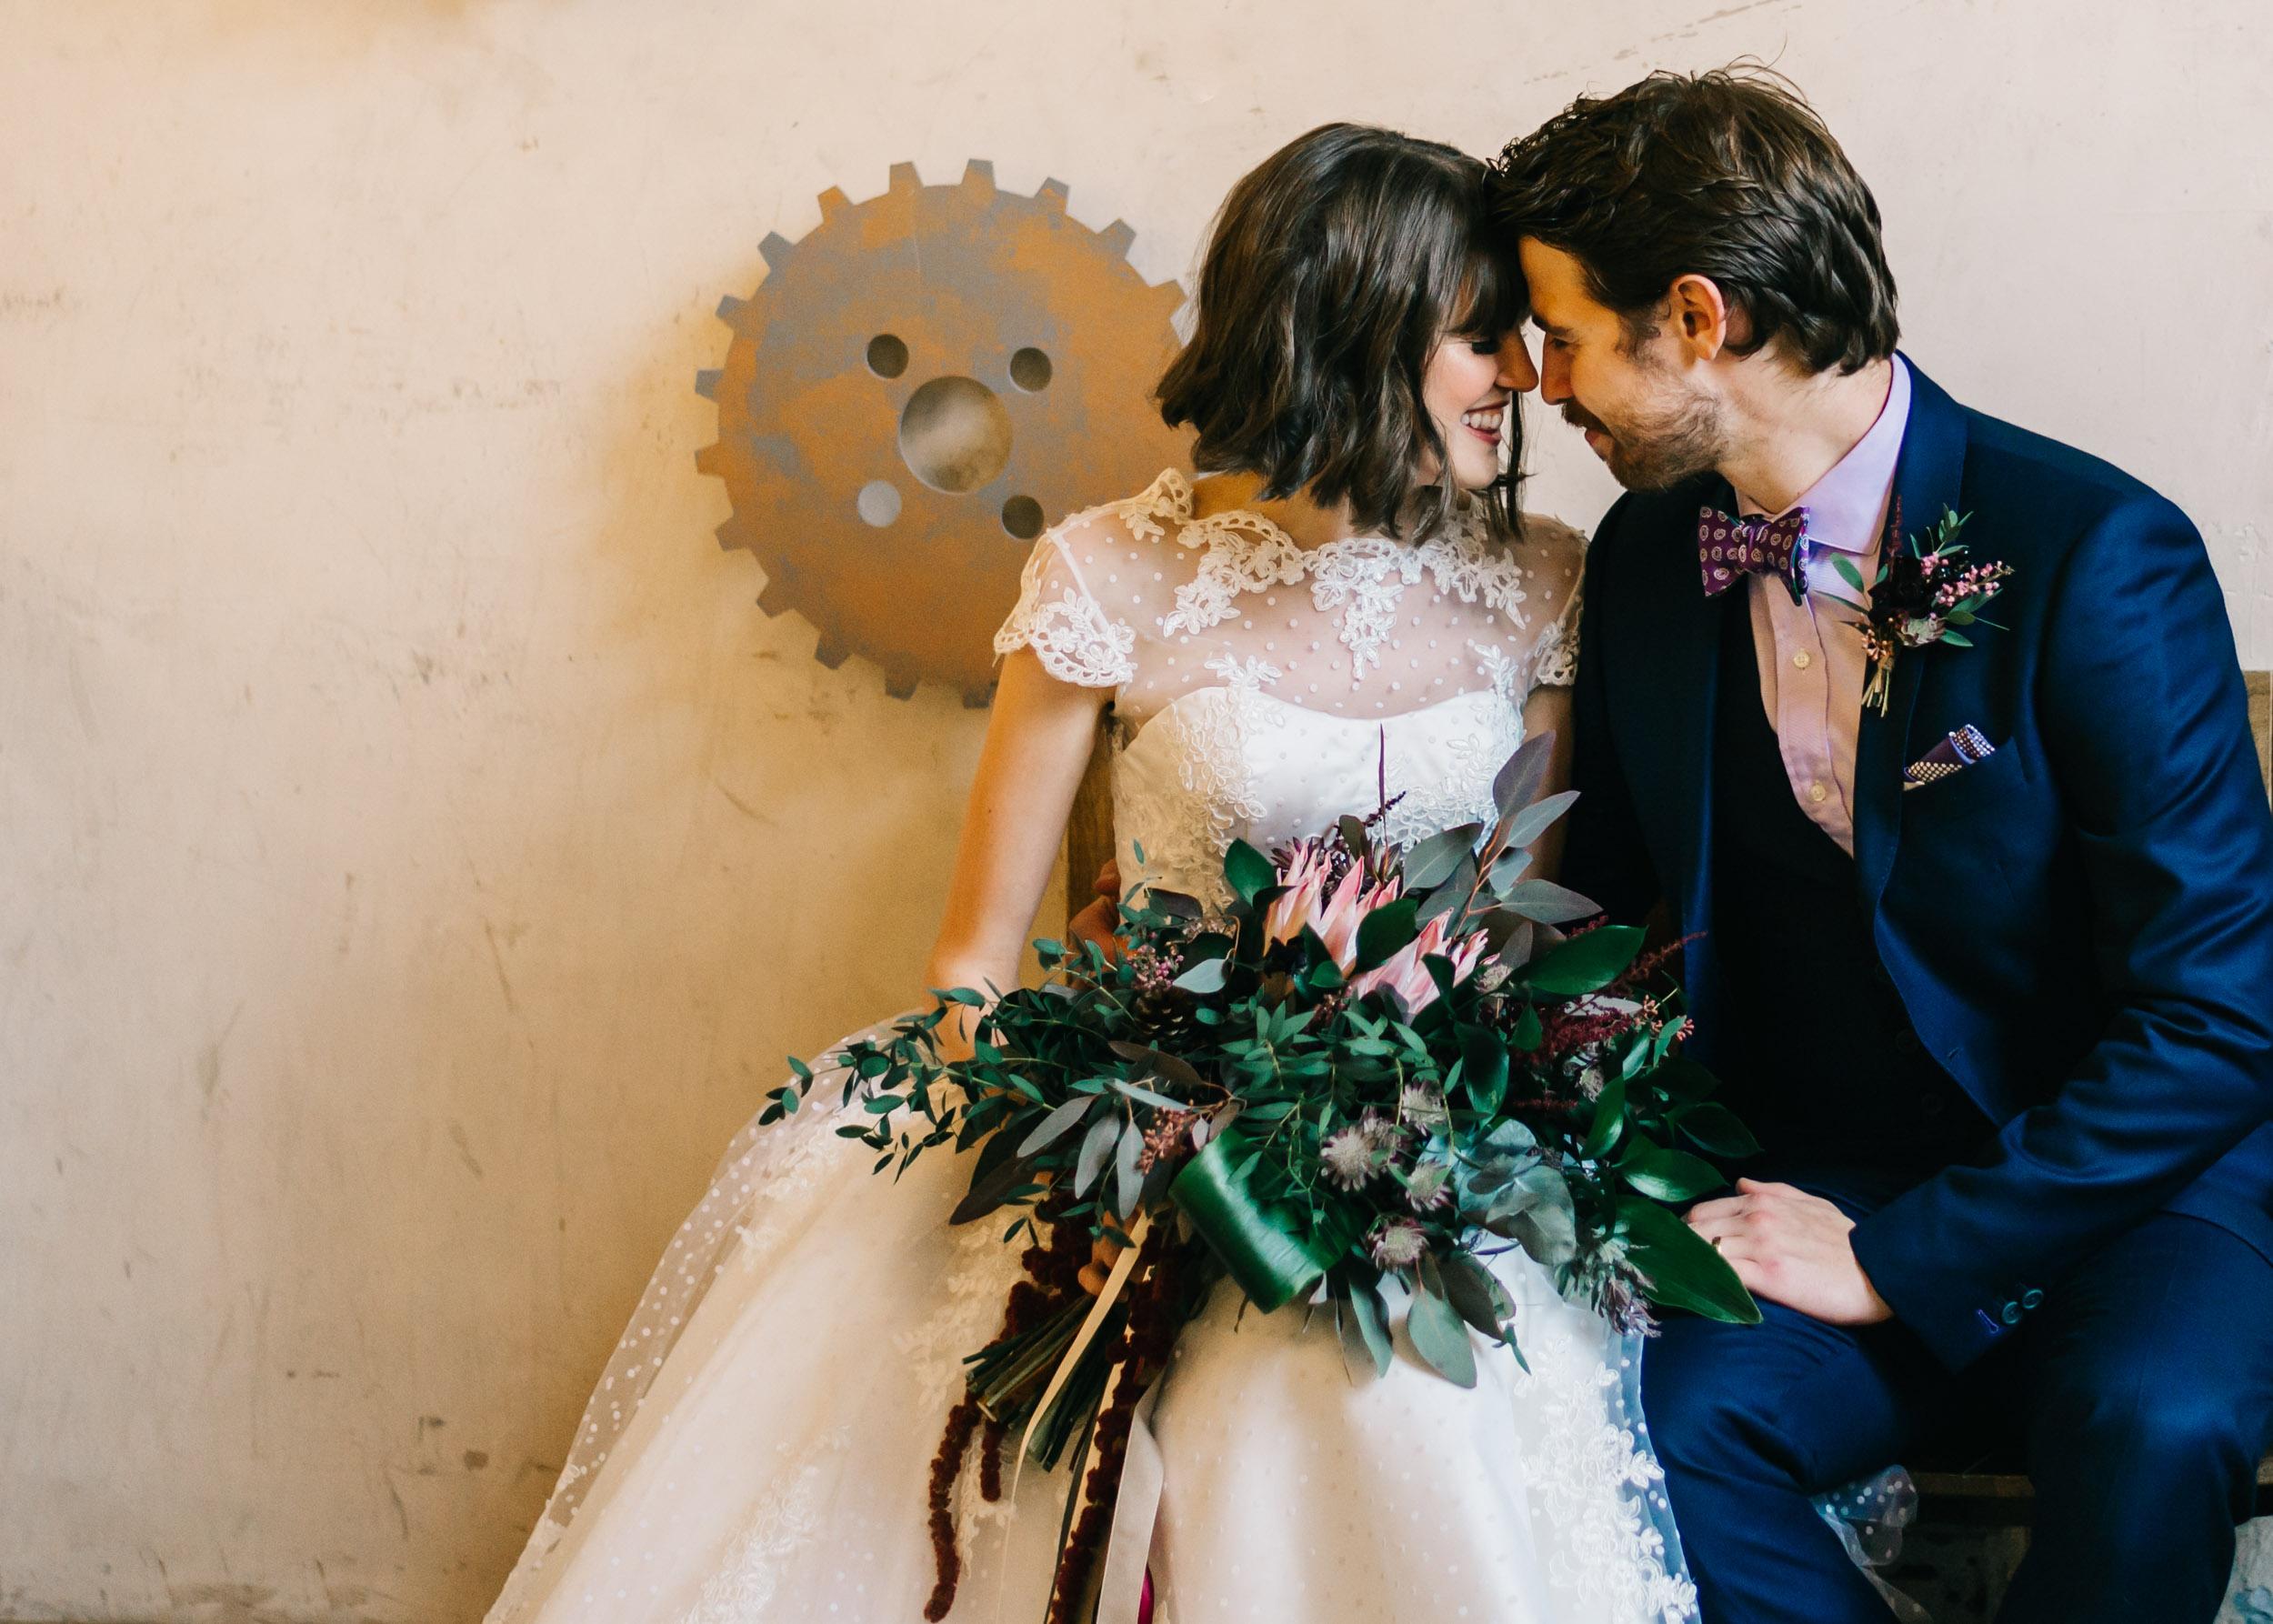 Holmes Mill, Clitheroe, Lancashire - Styled Wedding Shoot-25.jpg